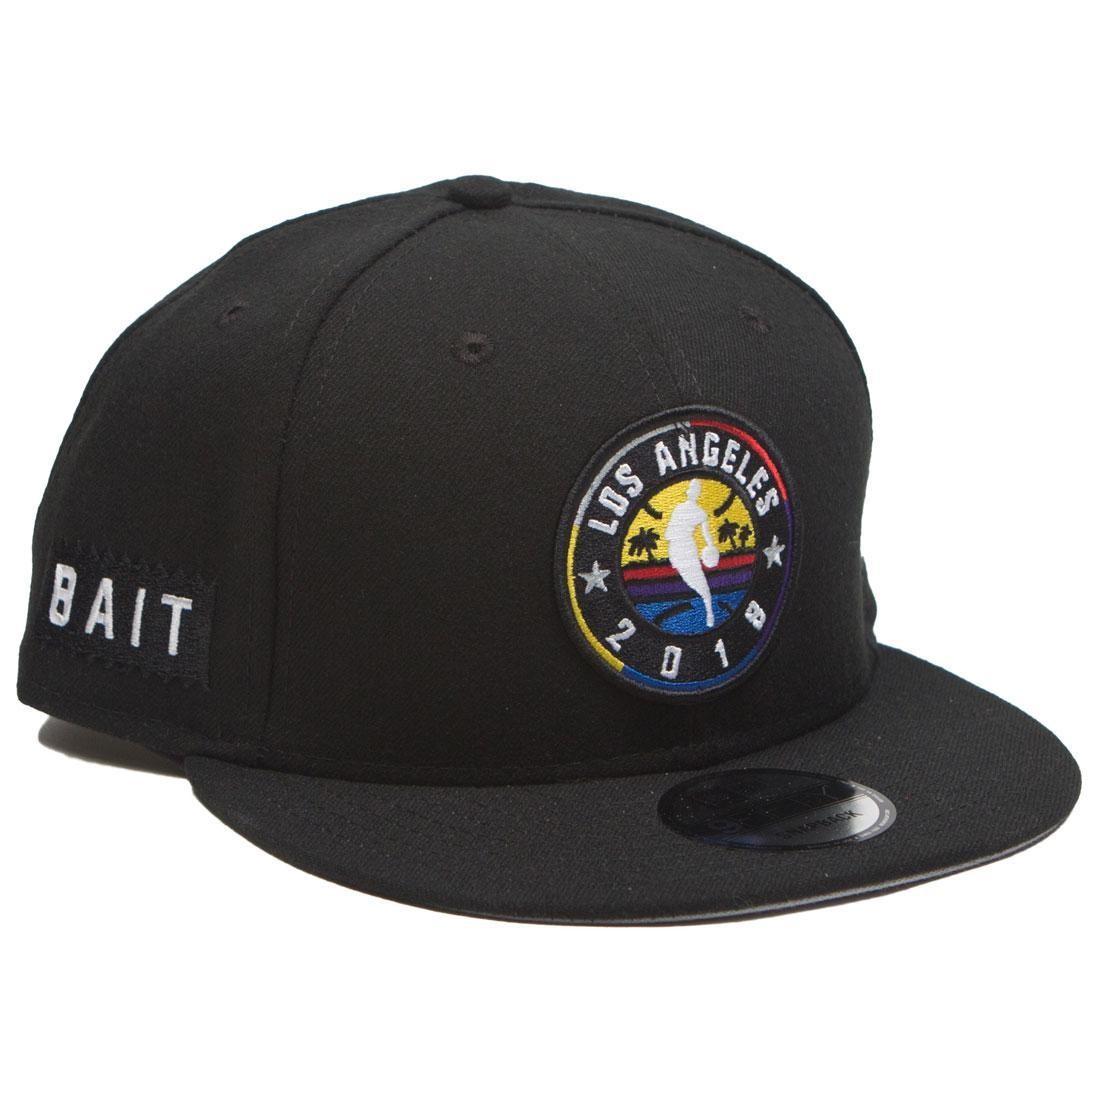 BAIT x NBA X New Era 9Fifty NBA All Star Game OTC Snapback Cap (black)